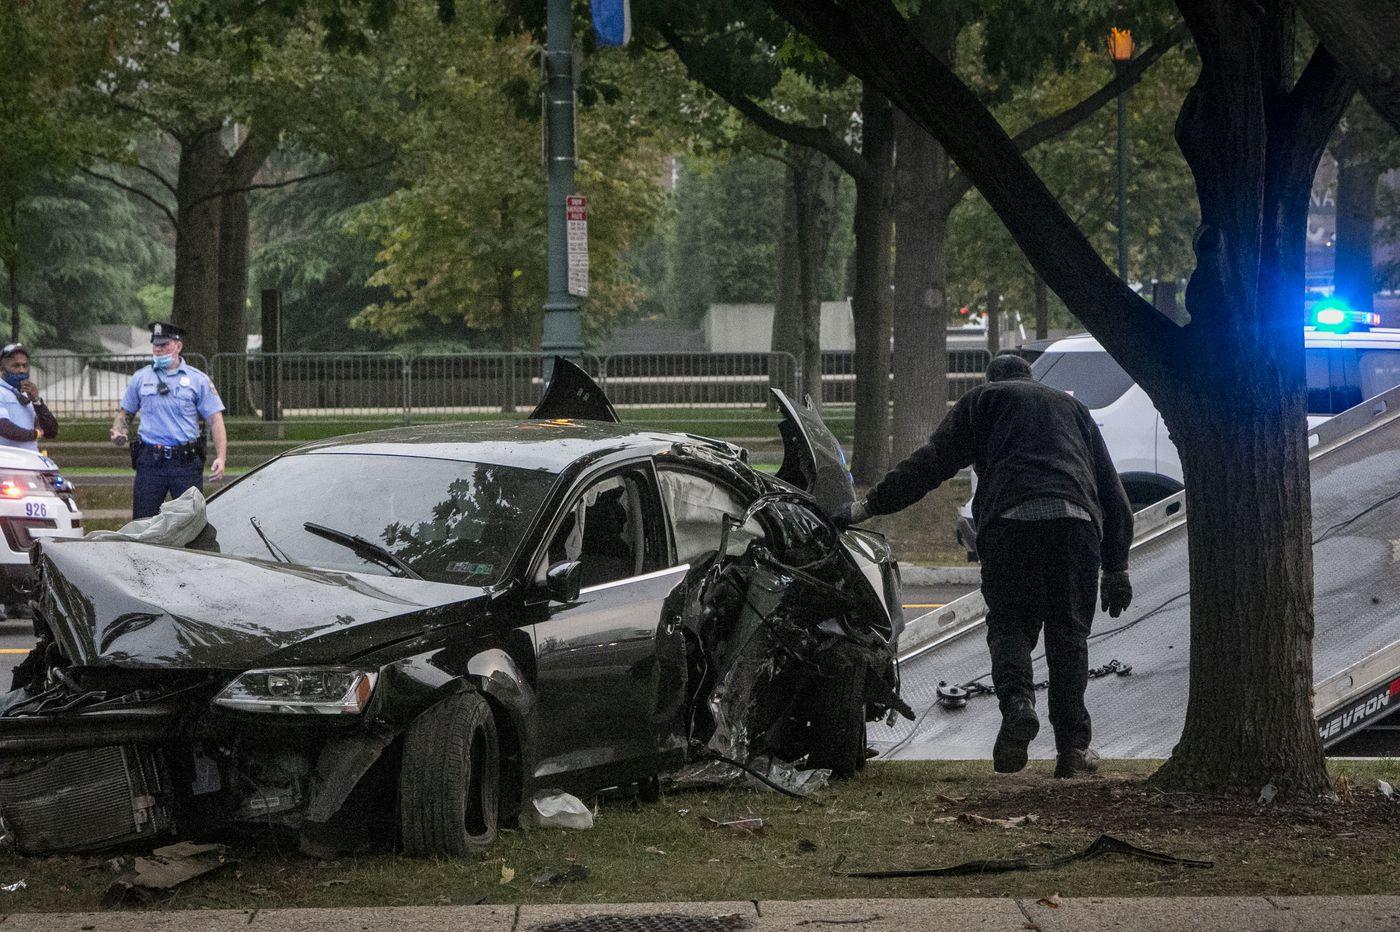 Man killed, woman injured in crash of speeding vehicle on Benjamin Franklin Parkway